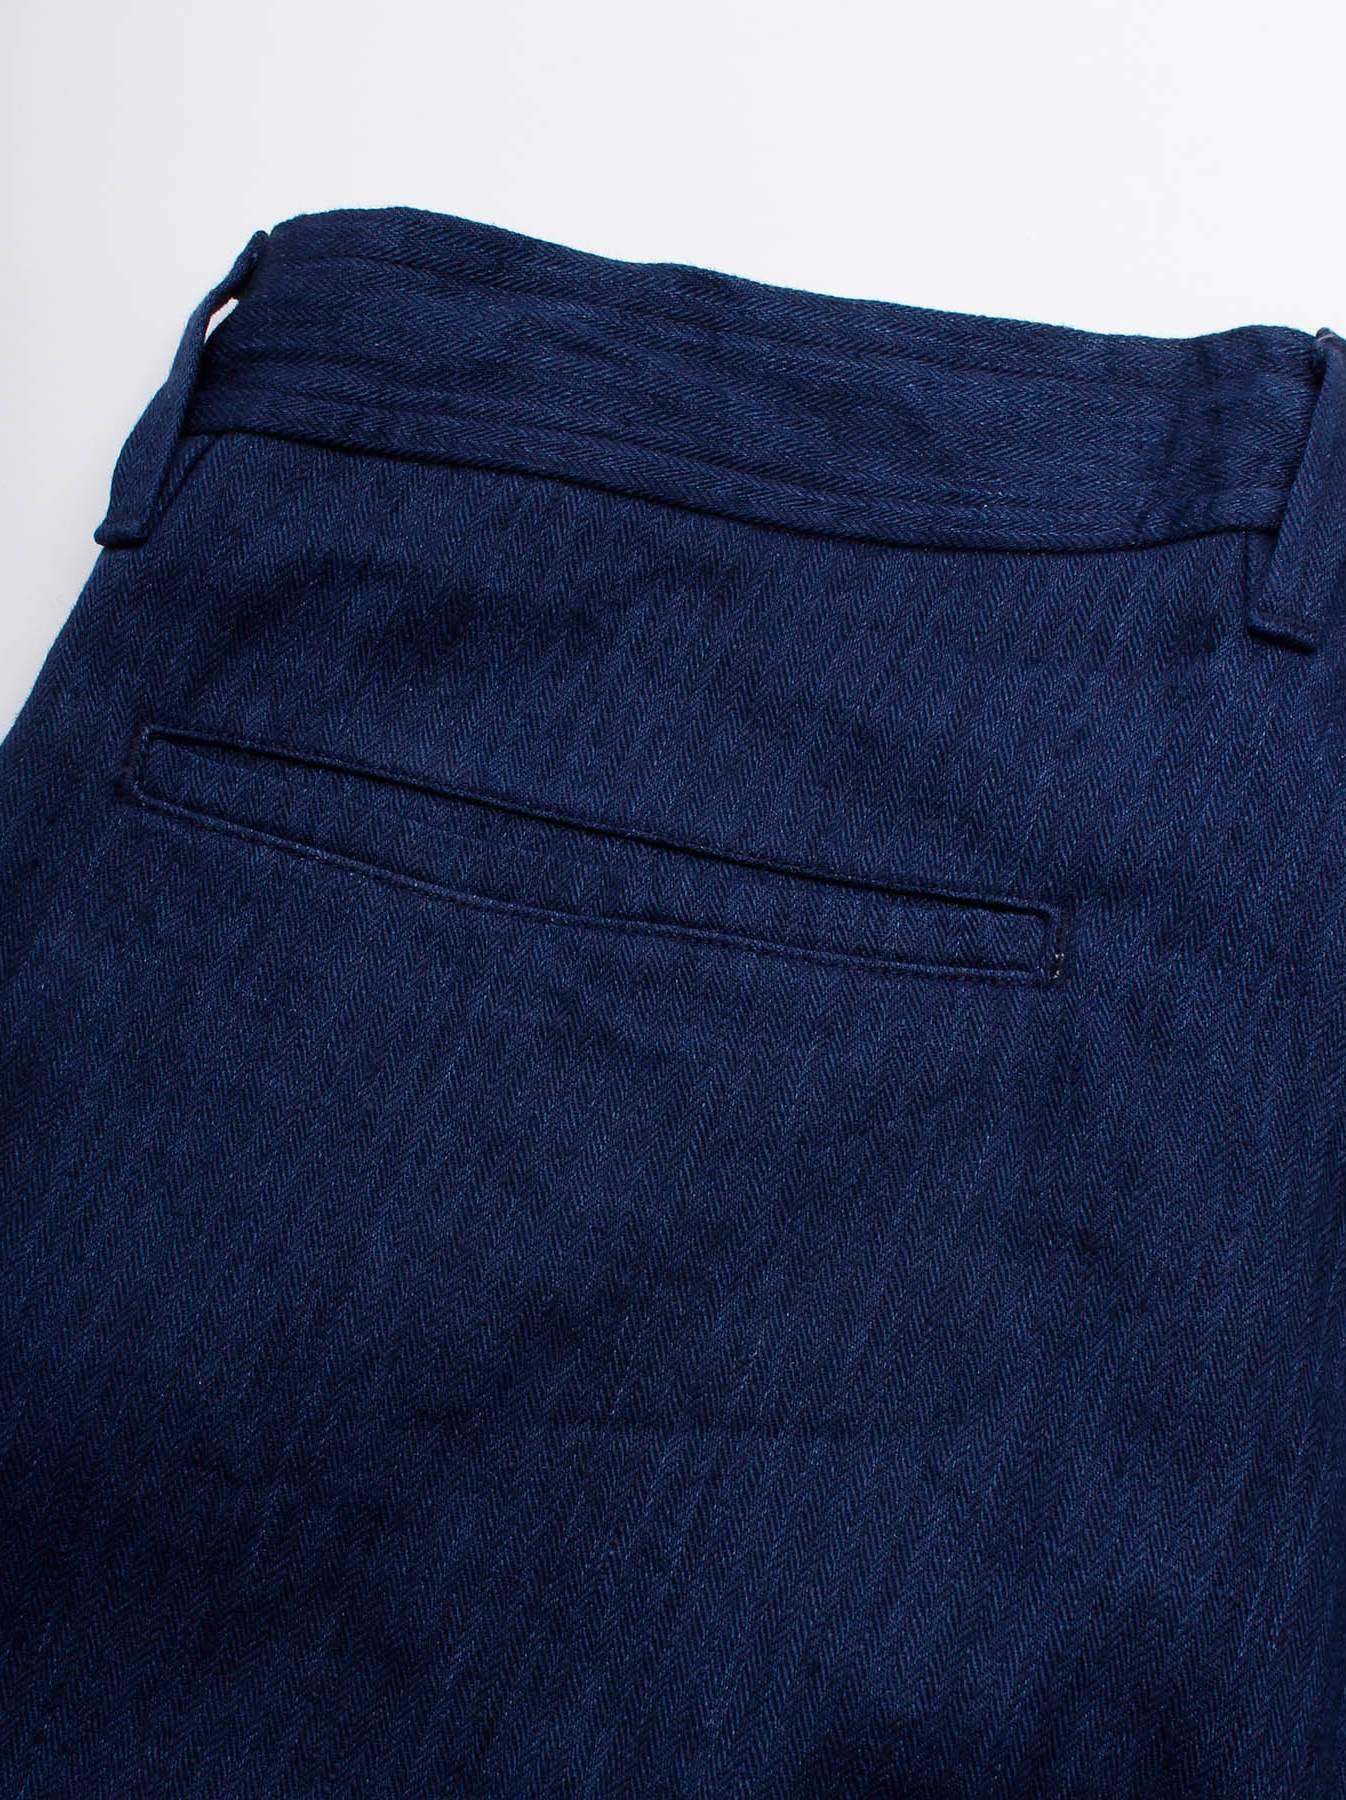 WH Indigo Linen Easy Slacks-9